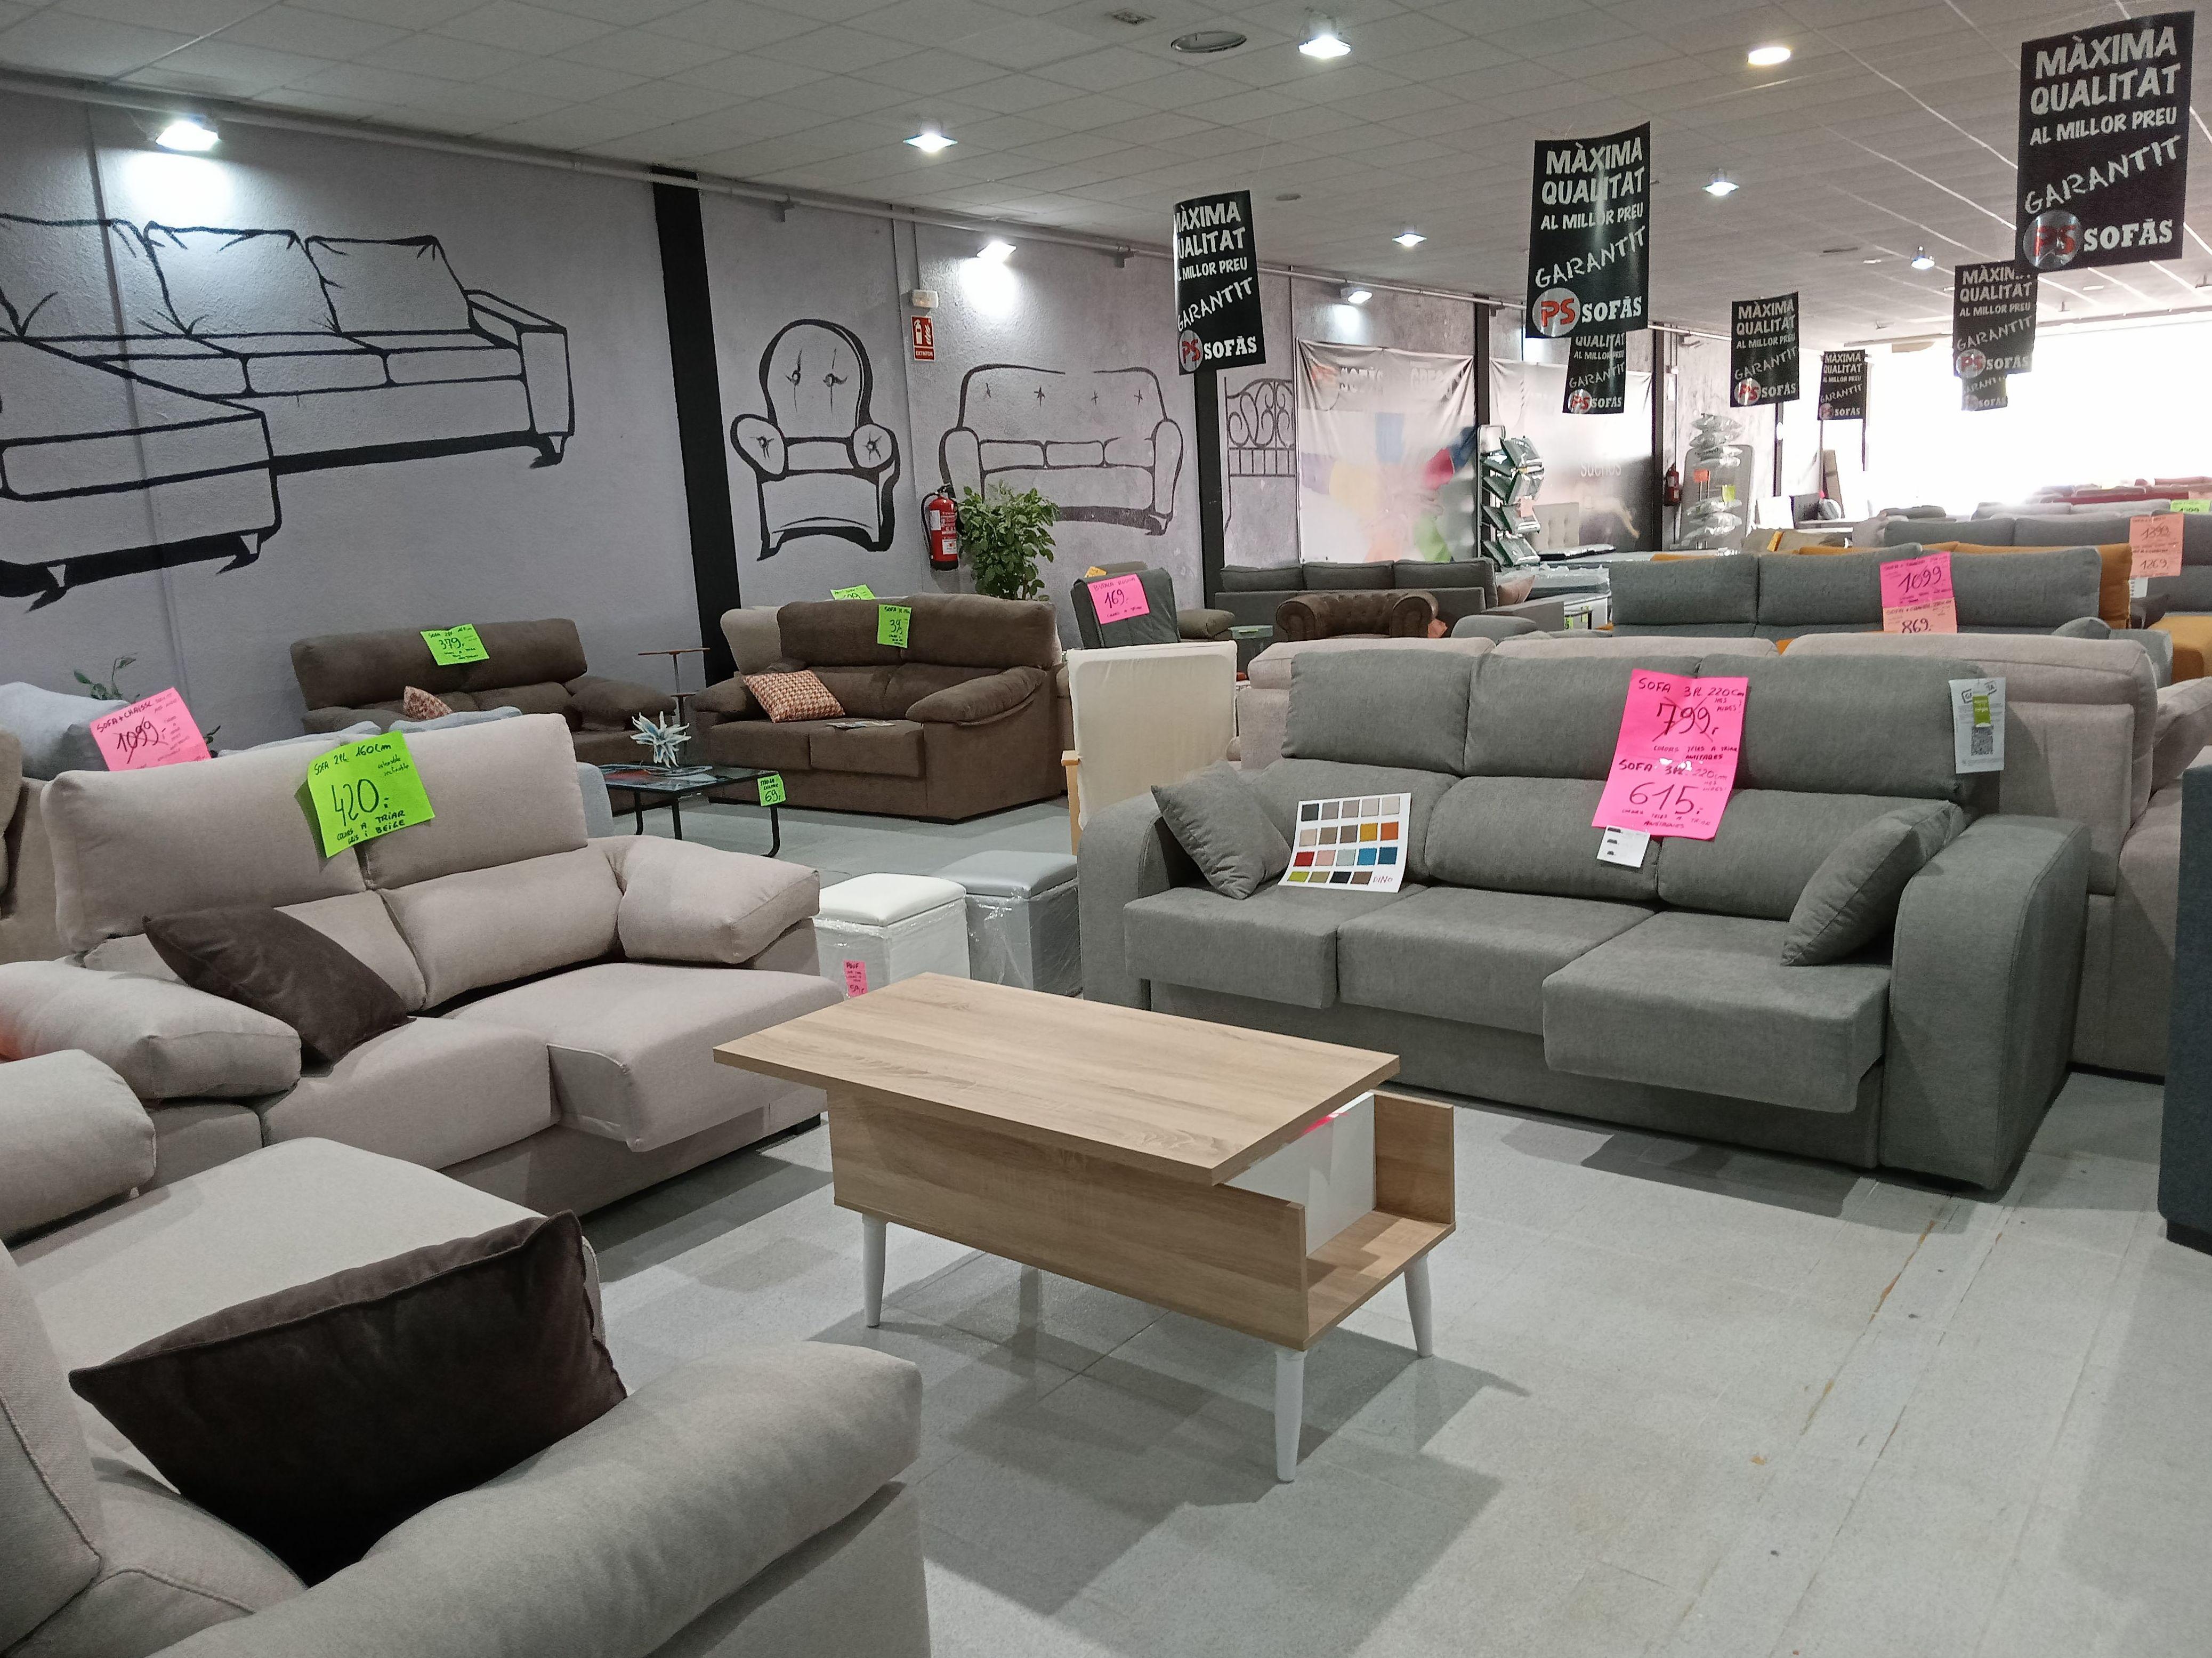 Foto 5 de Colchones, sofás y canapés en    PS Sofás